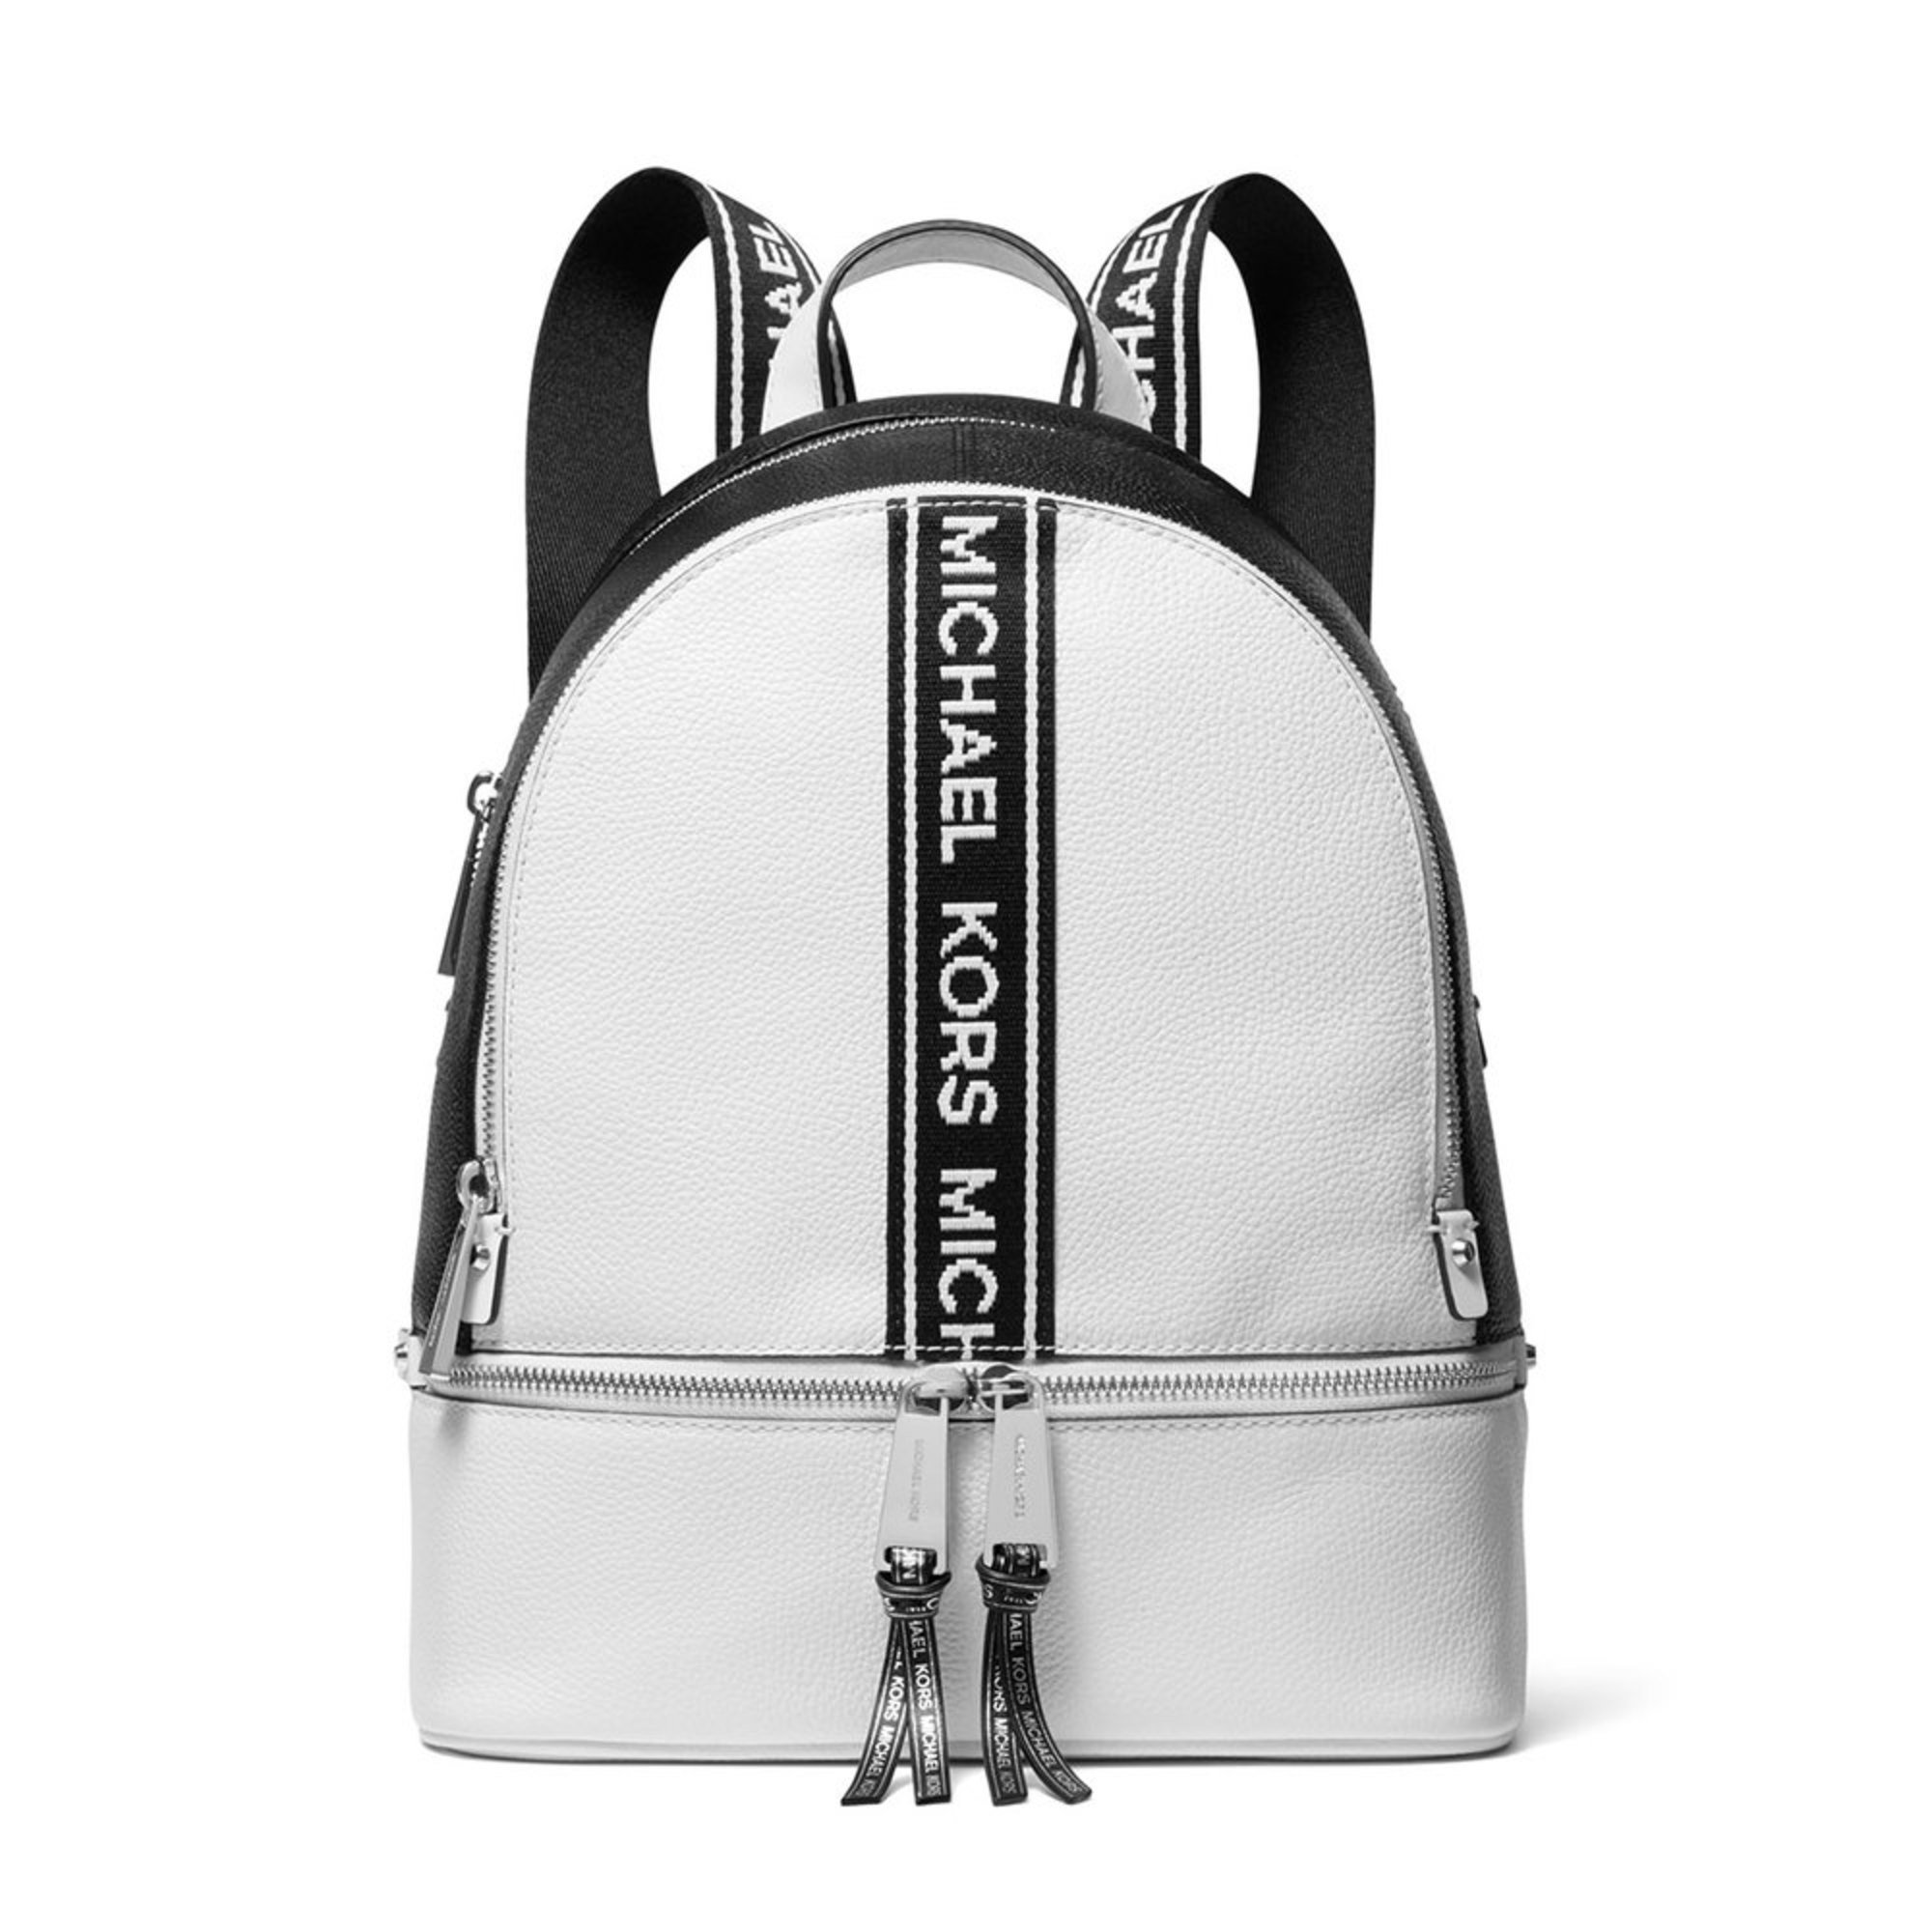 Michael Kors. Michael Kors Rhea Zip Medium Backpack 4bb5b4cc47736